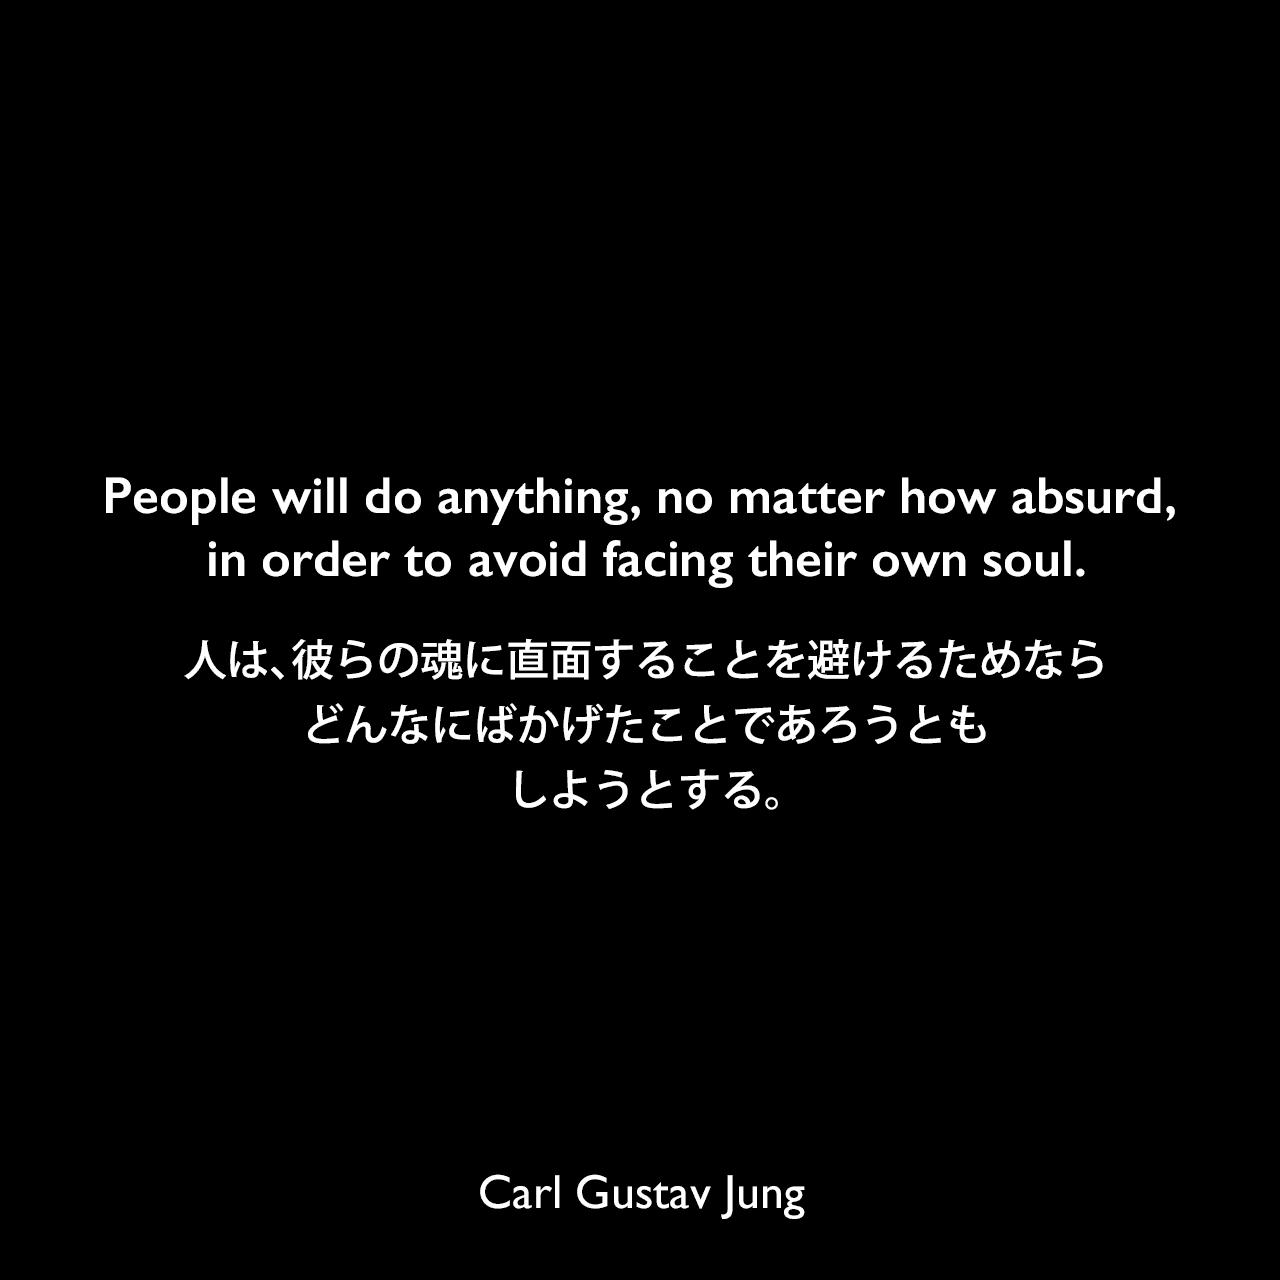 People will do anything, no matter how absurd, in order to avoid facing their own soul.人は、彼らの魂に直面することを避けるためなら、どんなにばかげたことであろうとも、しようとする。- ユングによる本「心理学と錬金術」よりCarl Gustav Jung